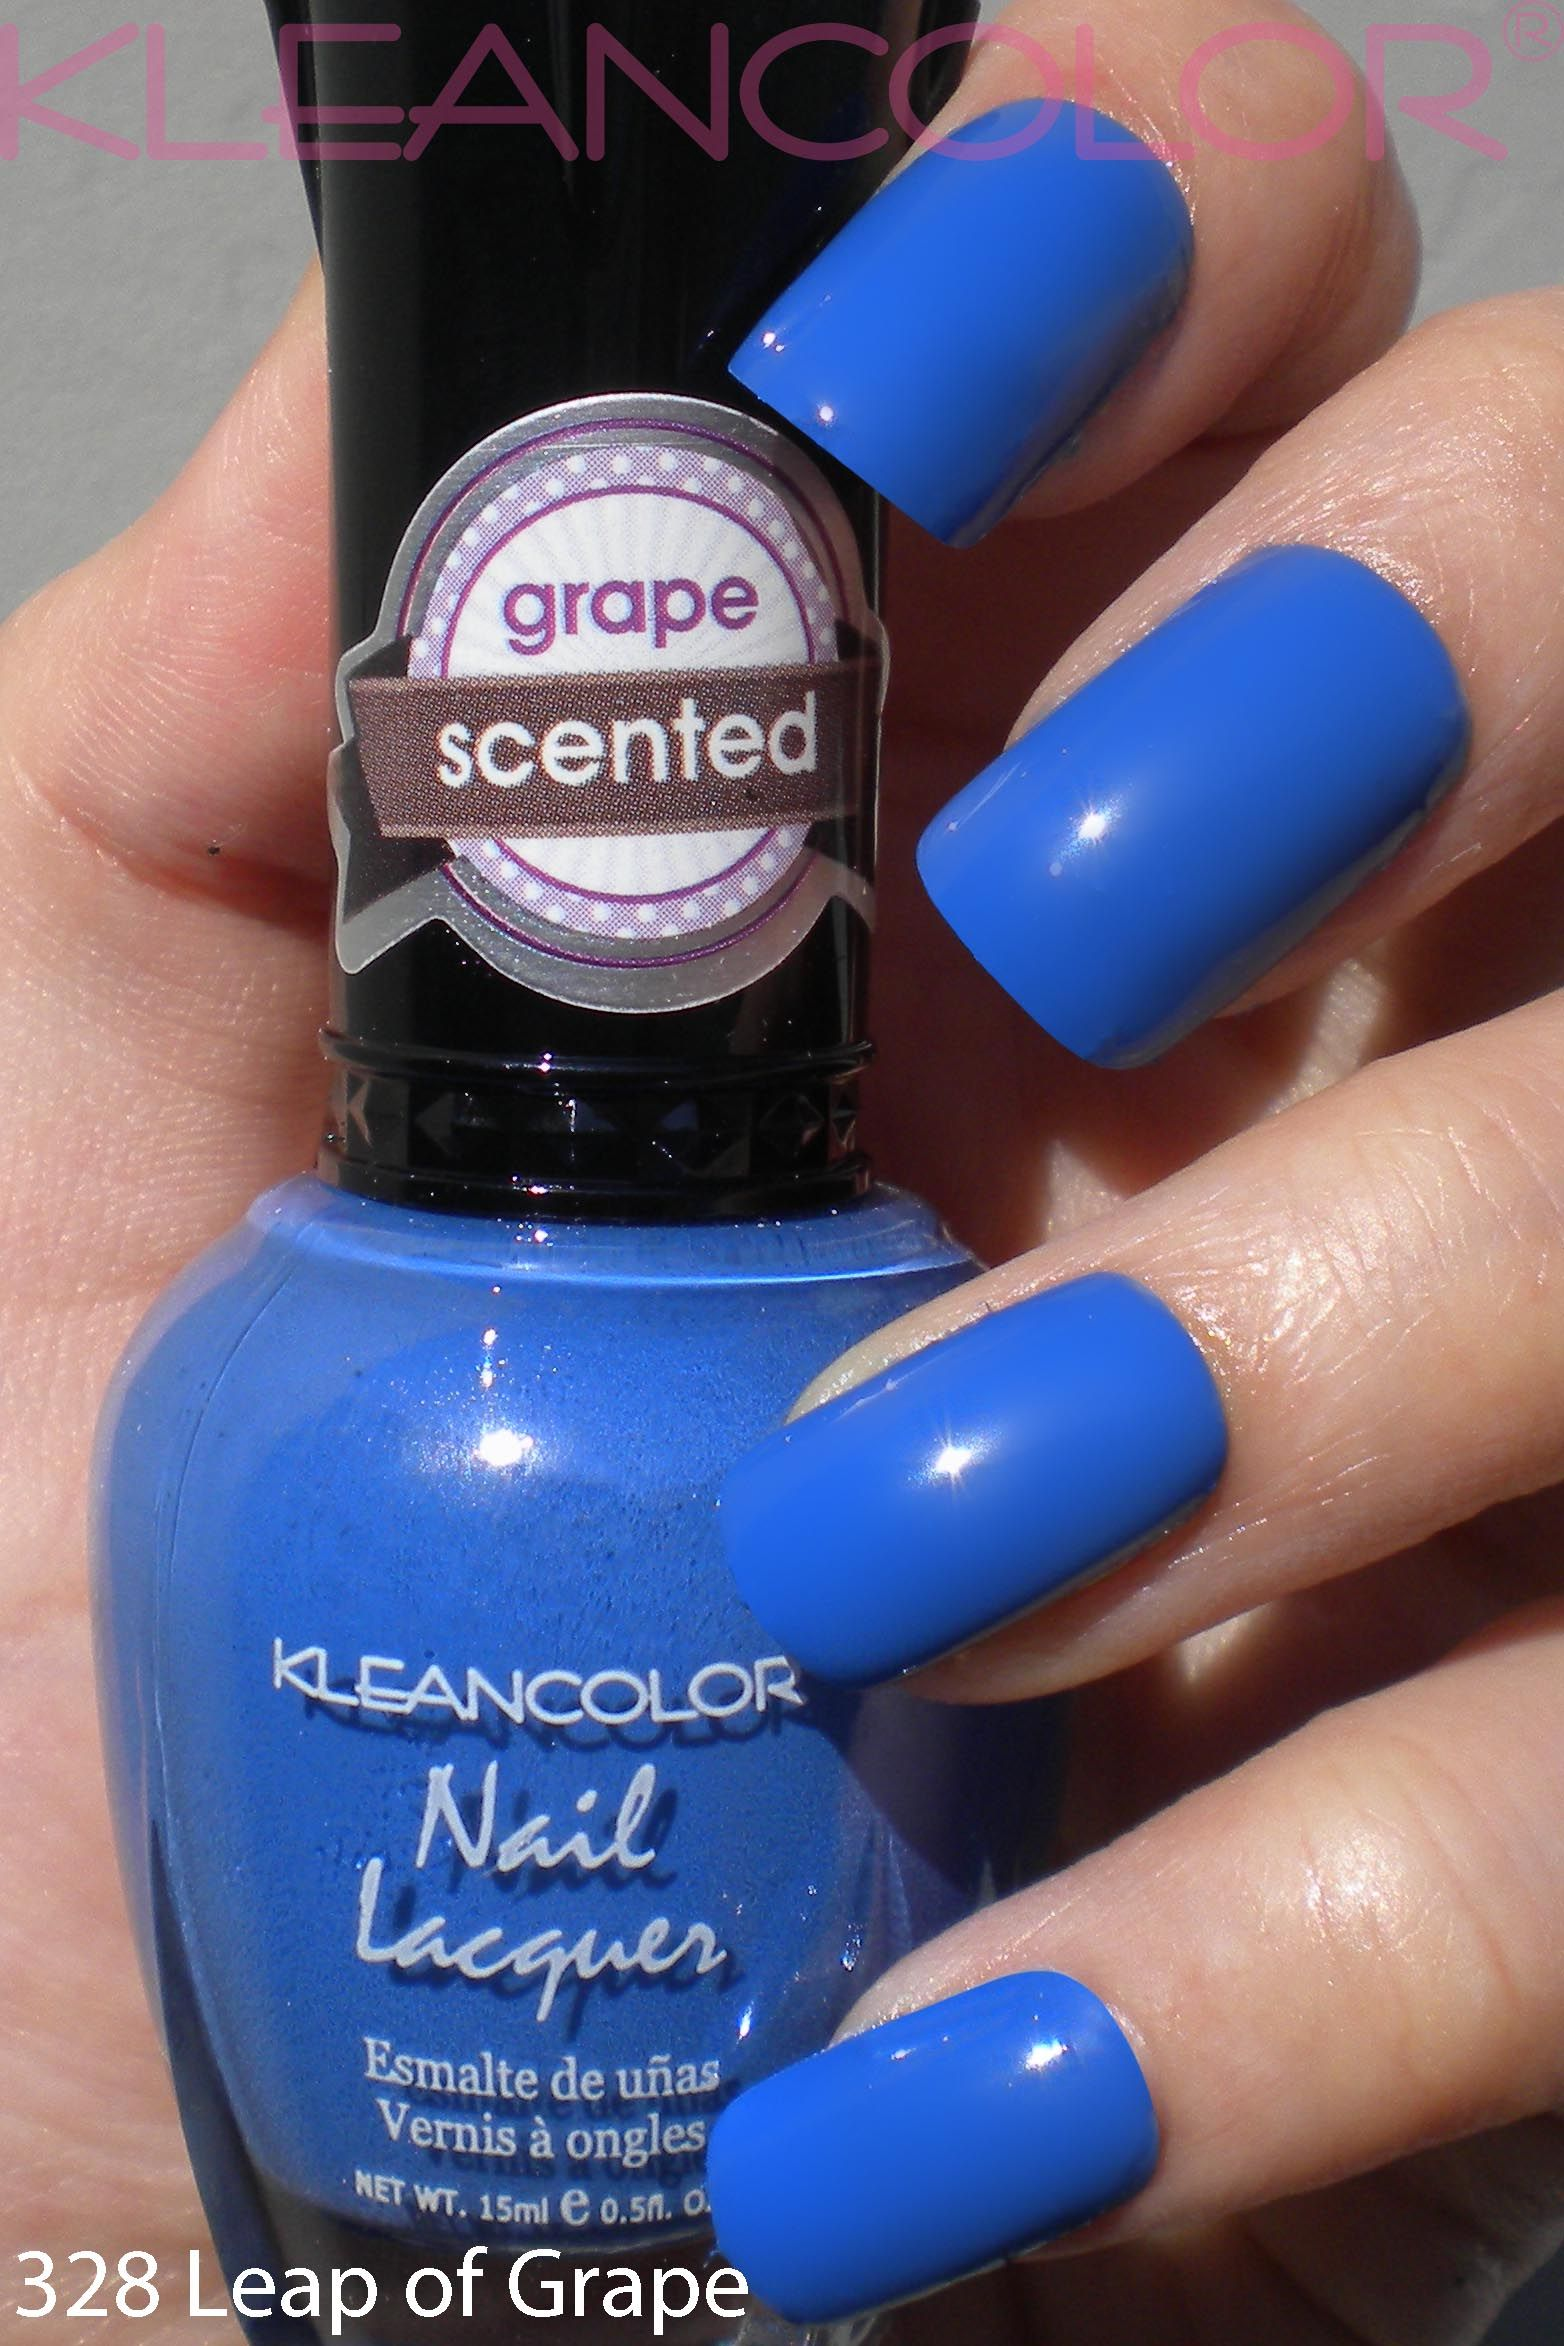 328 Leap of Grape #scentedpolish #fragrancepolish | Scented Nail ...